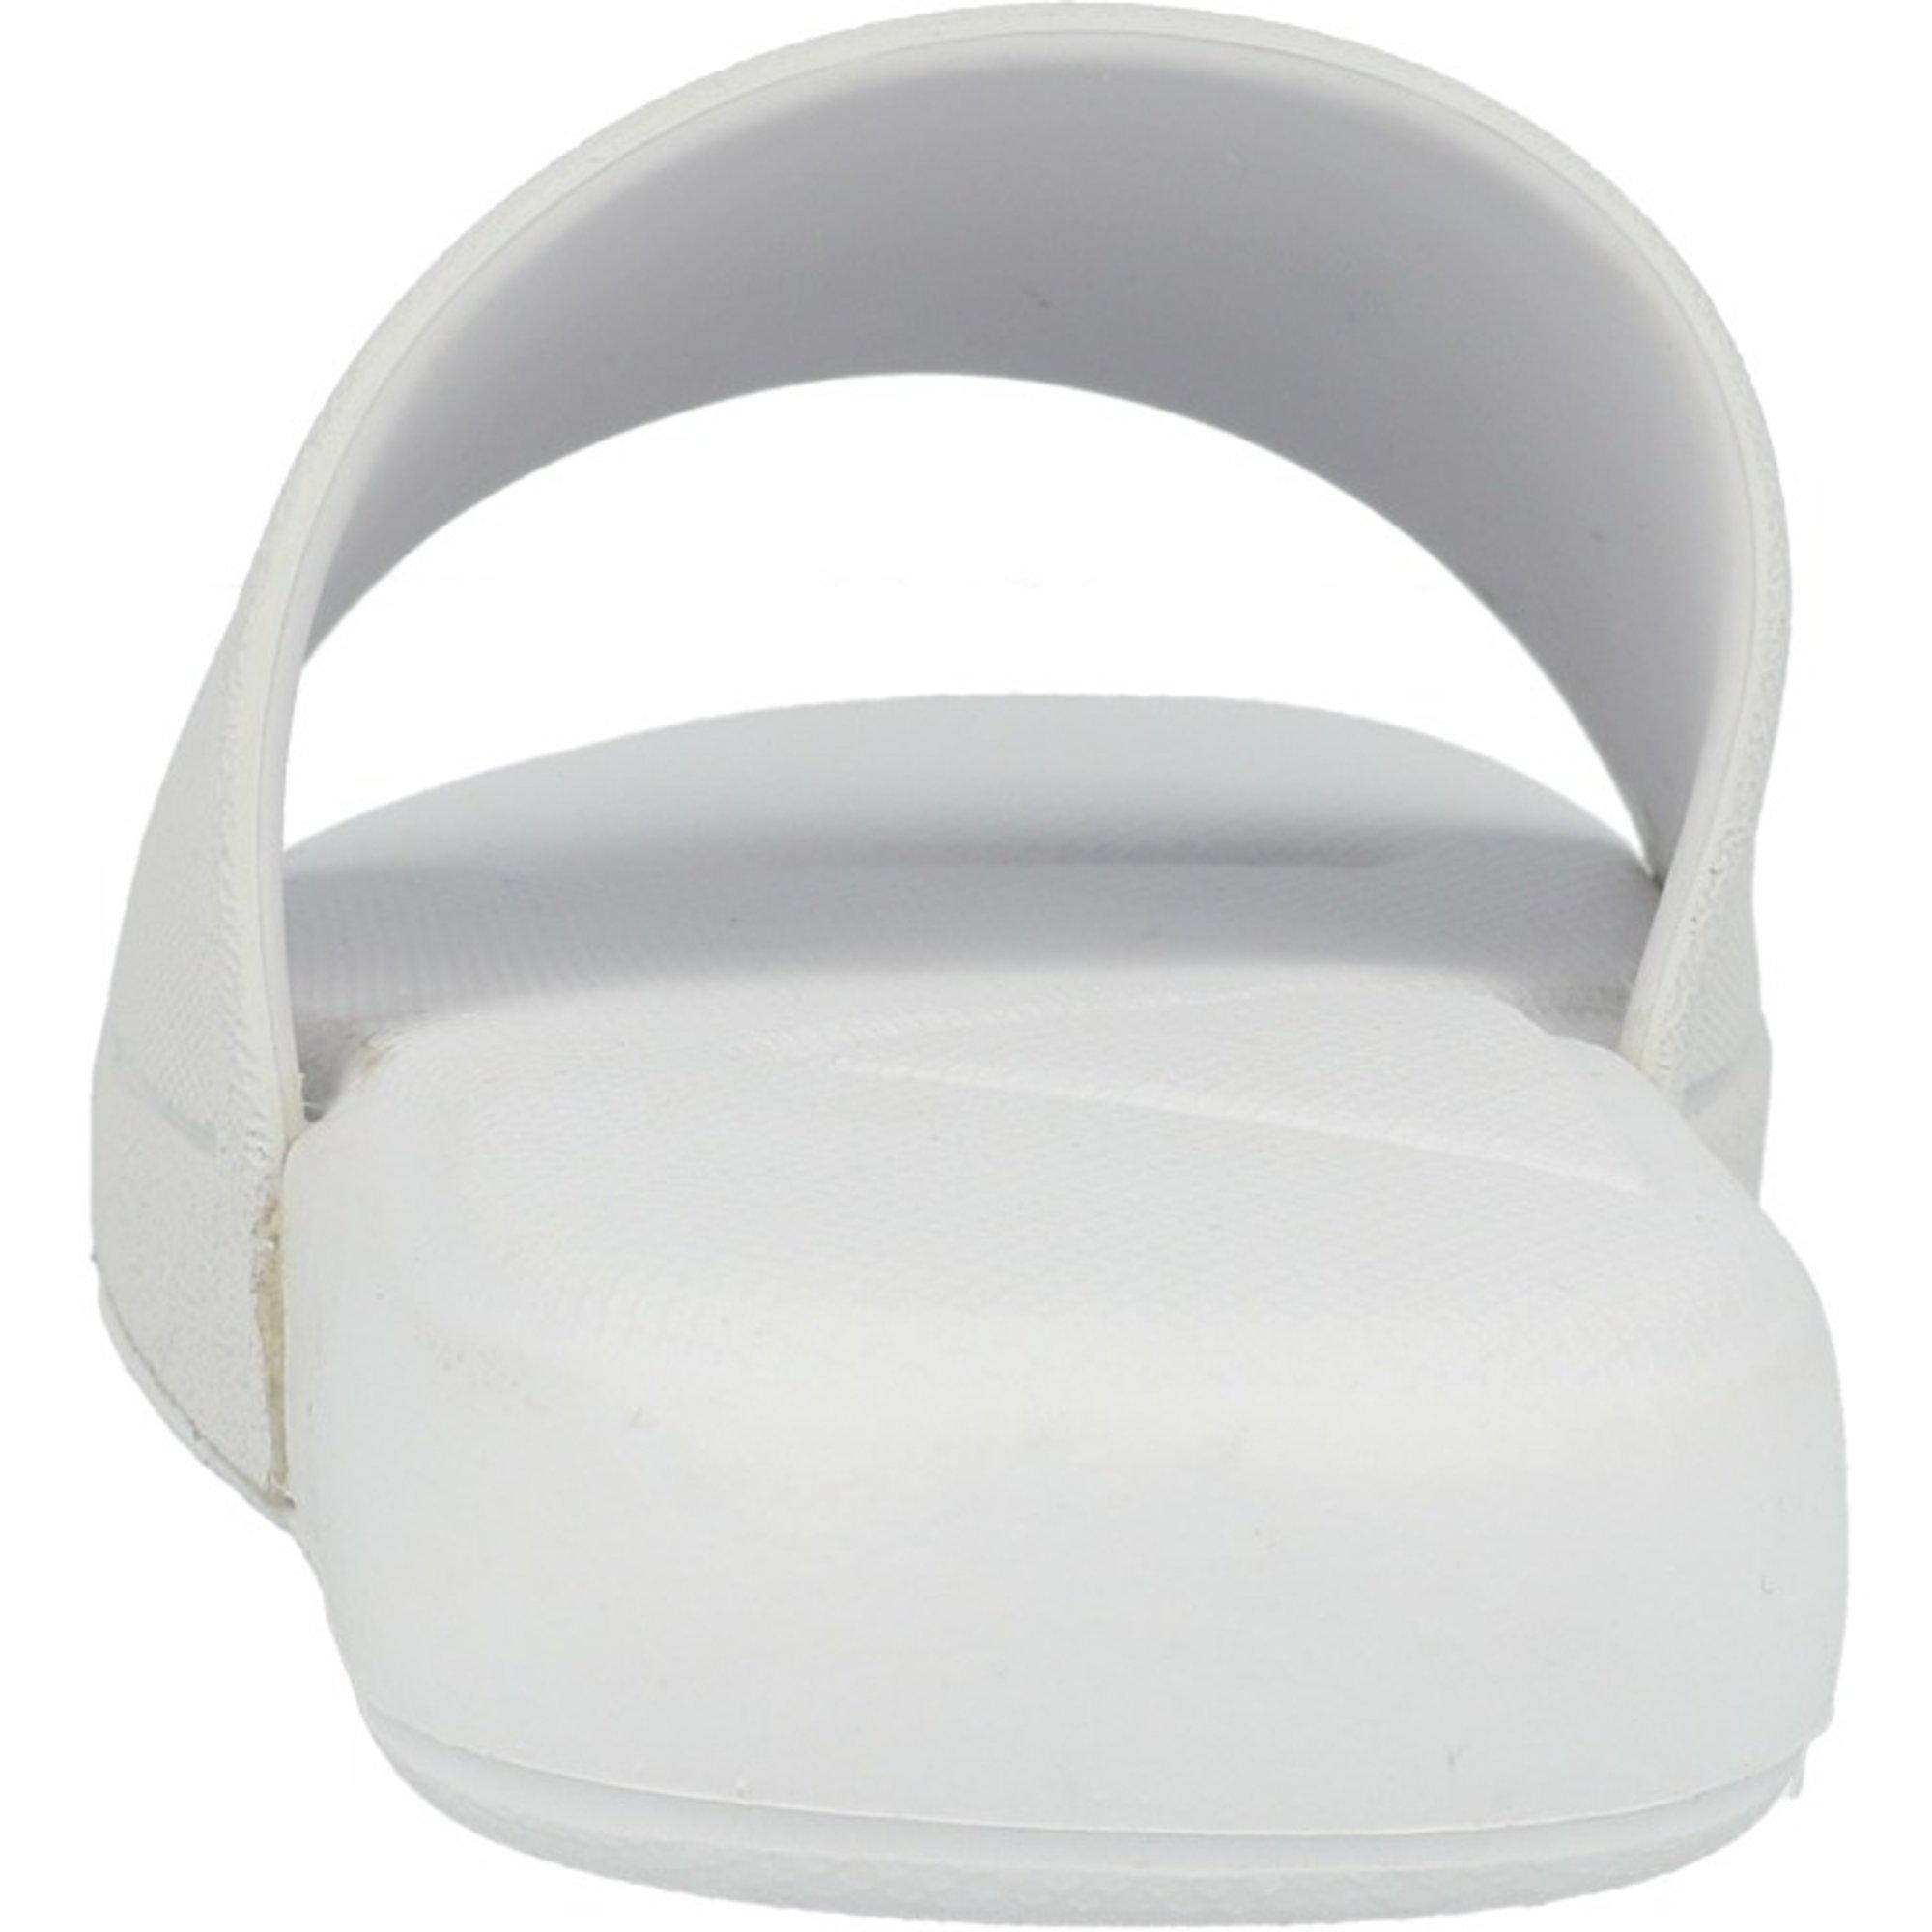 Lacoste L.30 Slide 120 1 White/Blue Synthetic